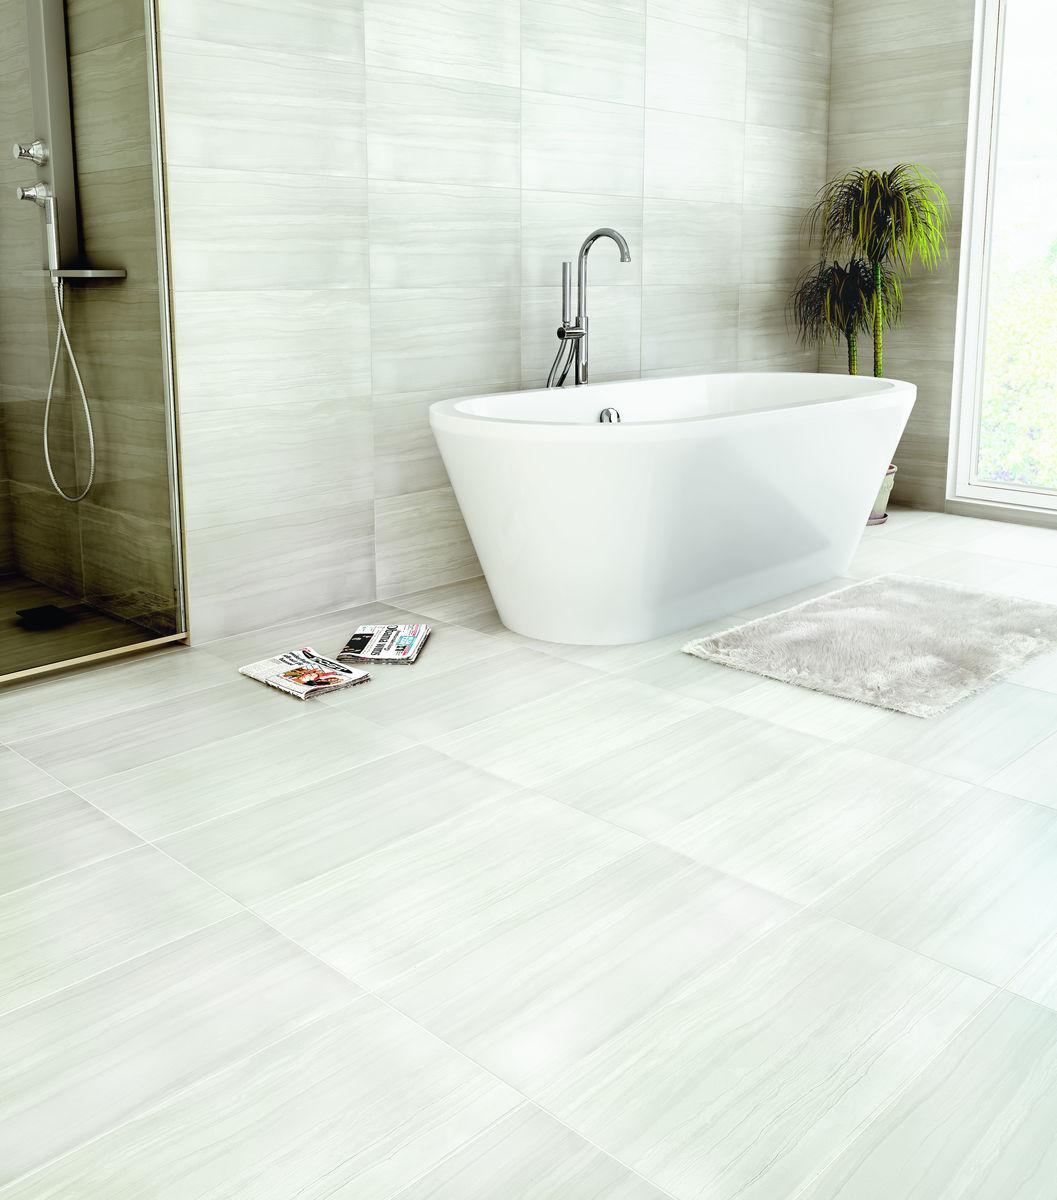 Marmo Acero Bianco (znxma1r) изображение 1